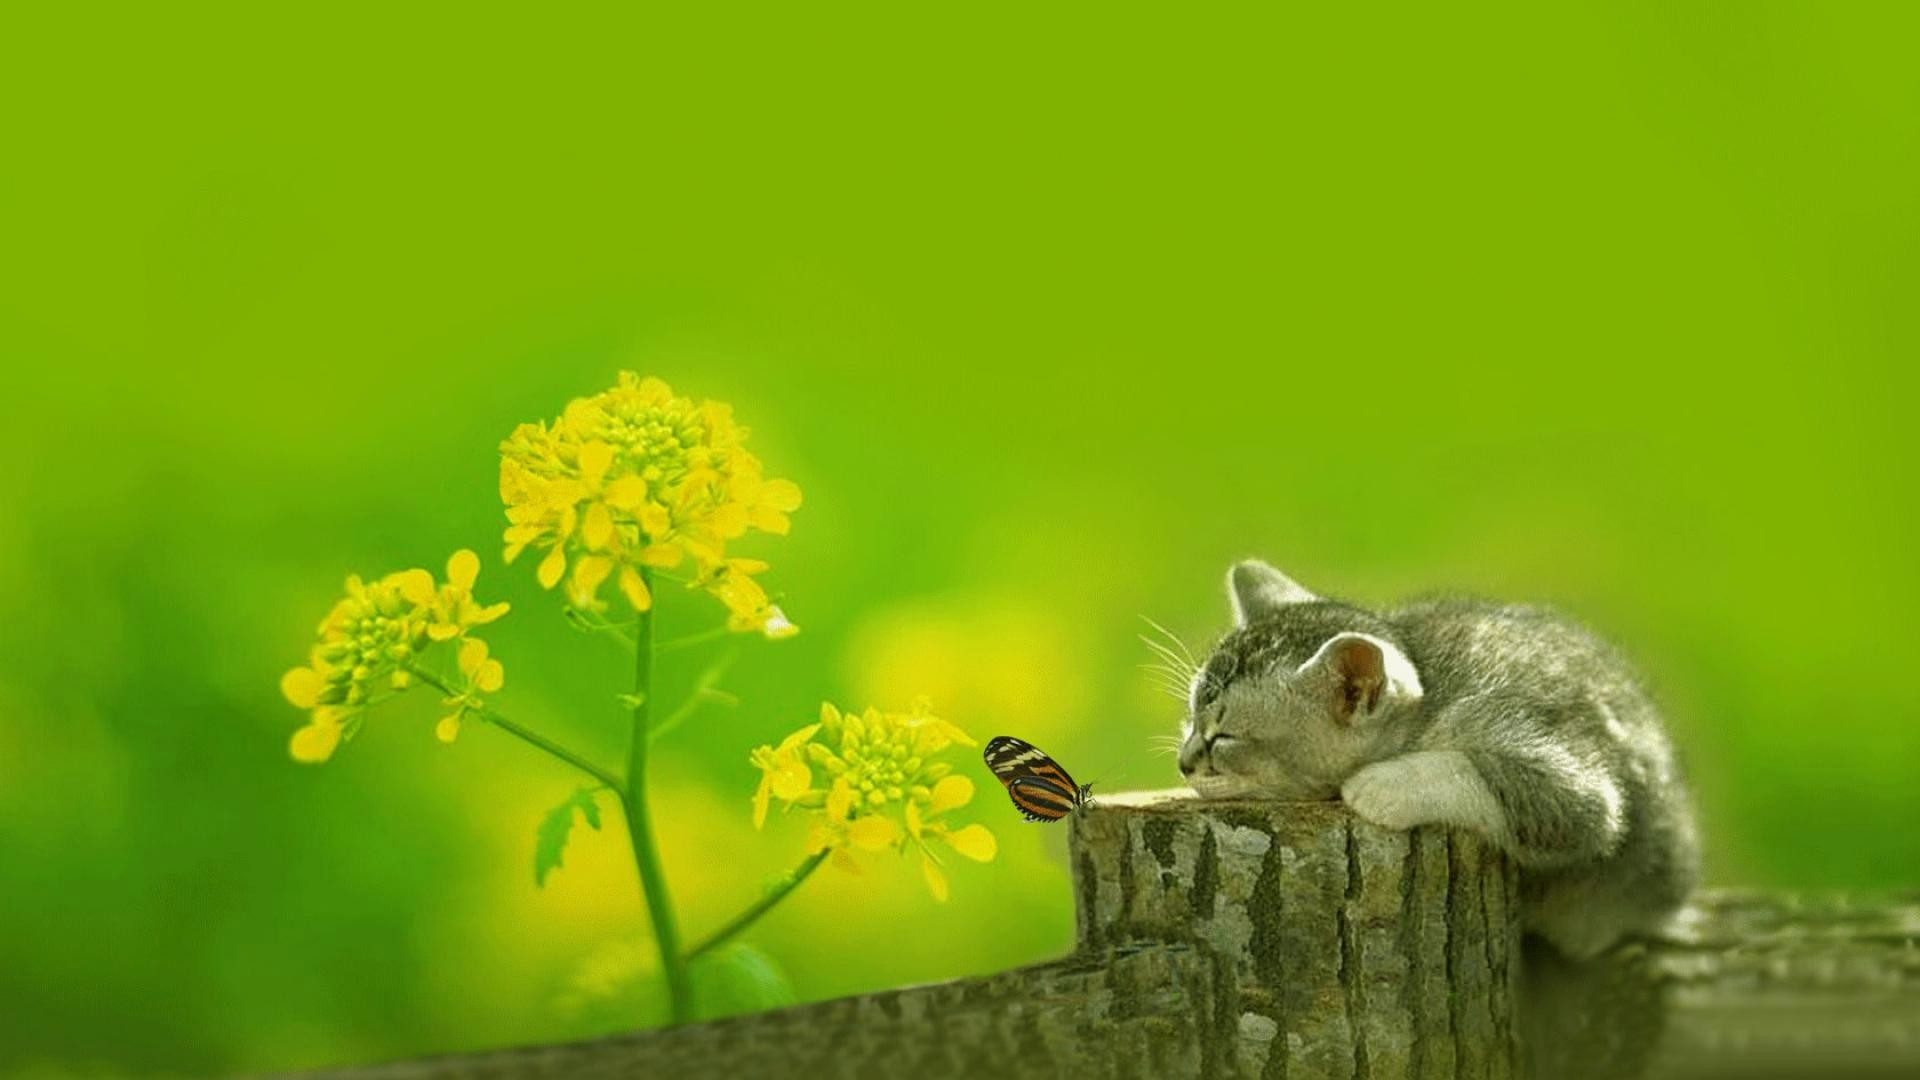 wallpaper.wiki-Desktop-cute-images-hd-download-PIC-